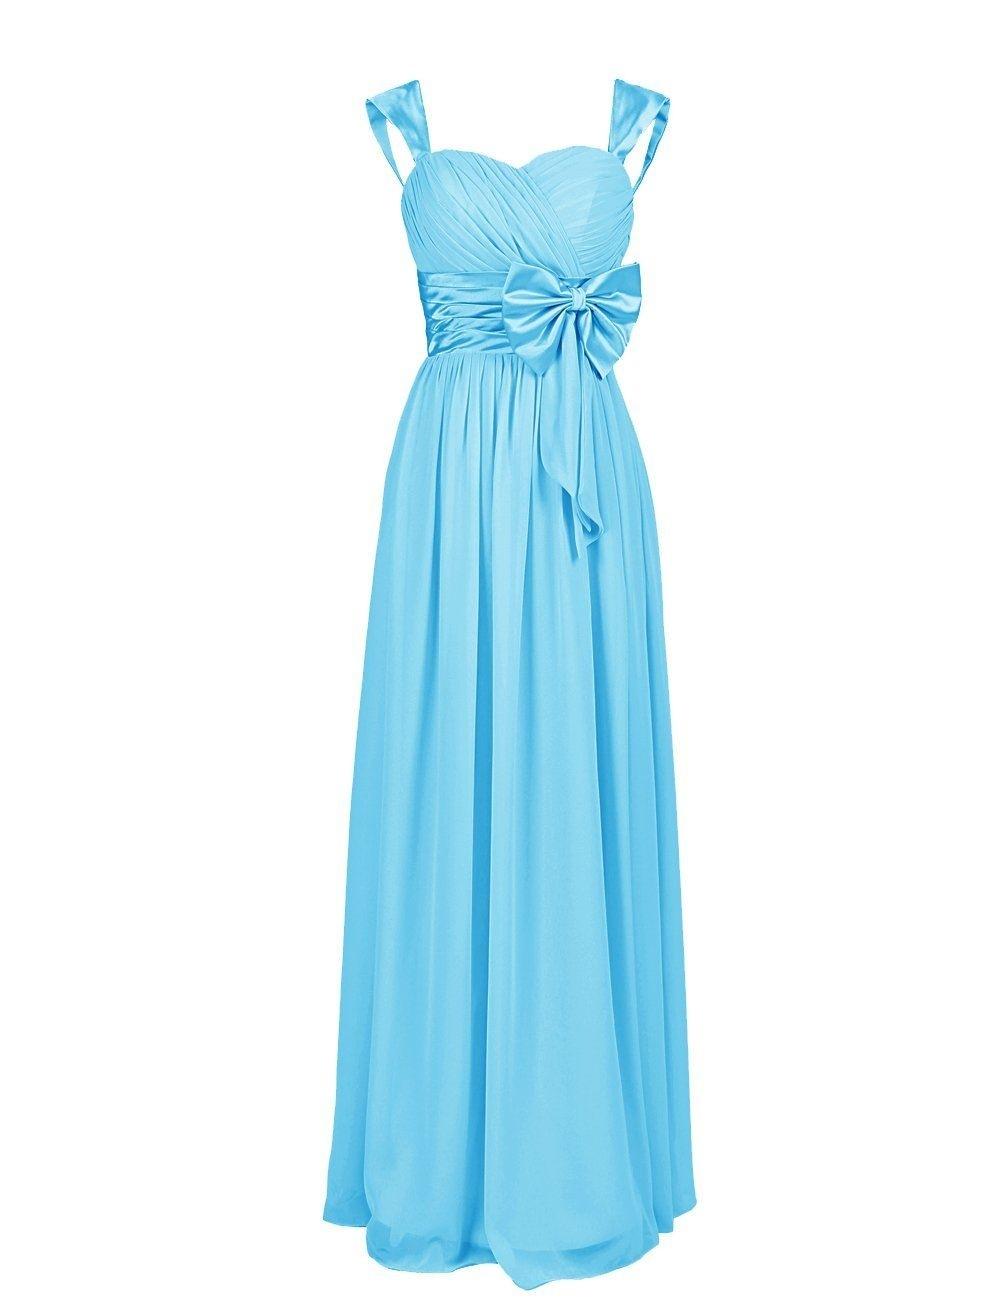 20 Wunderbar Lange Sommerkleider Damen Stylish15 Fantastisch Lange Sommerkleider Damen Bester Preis